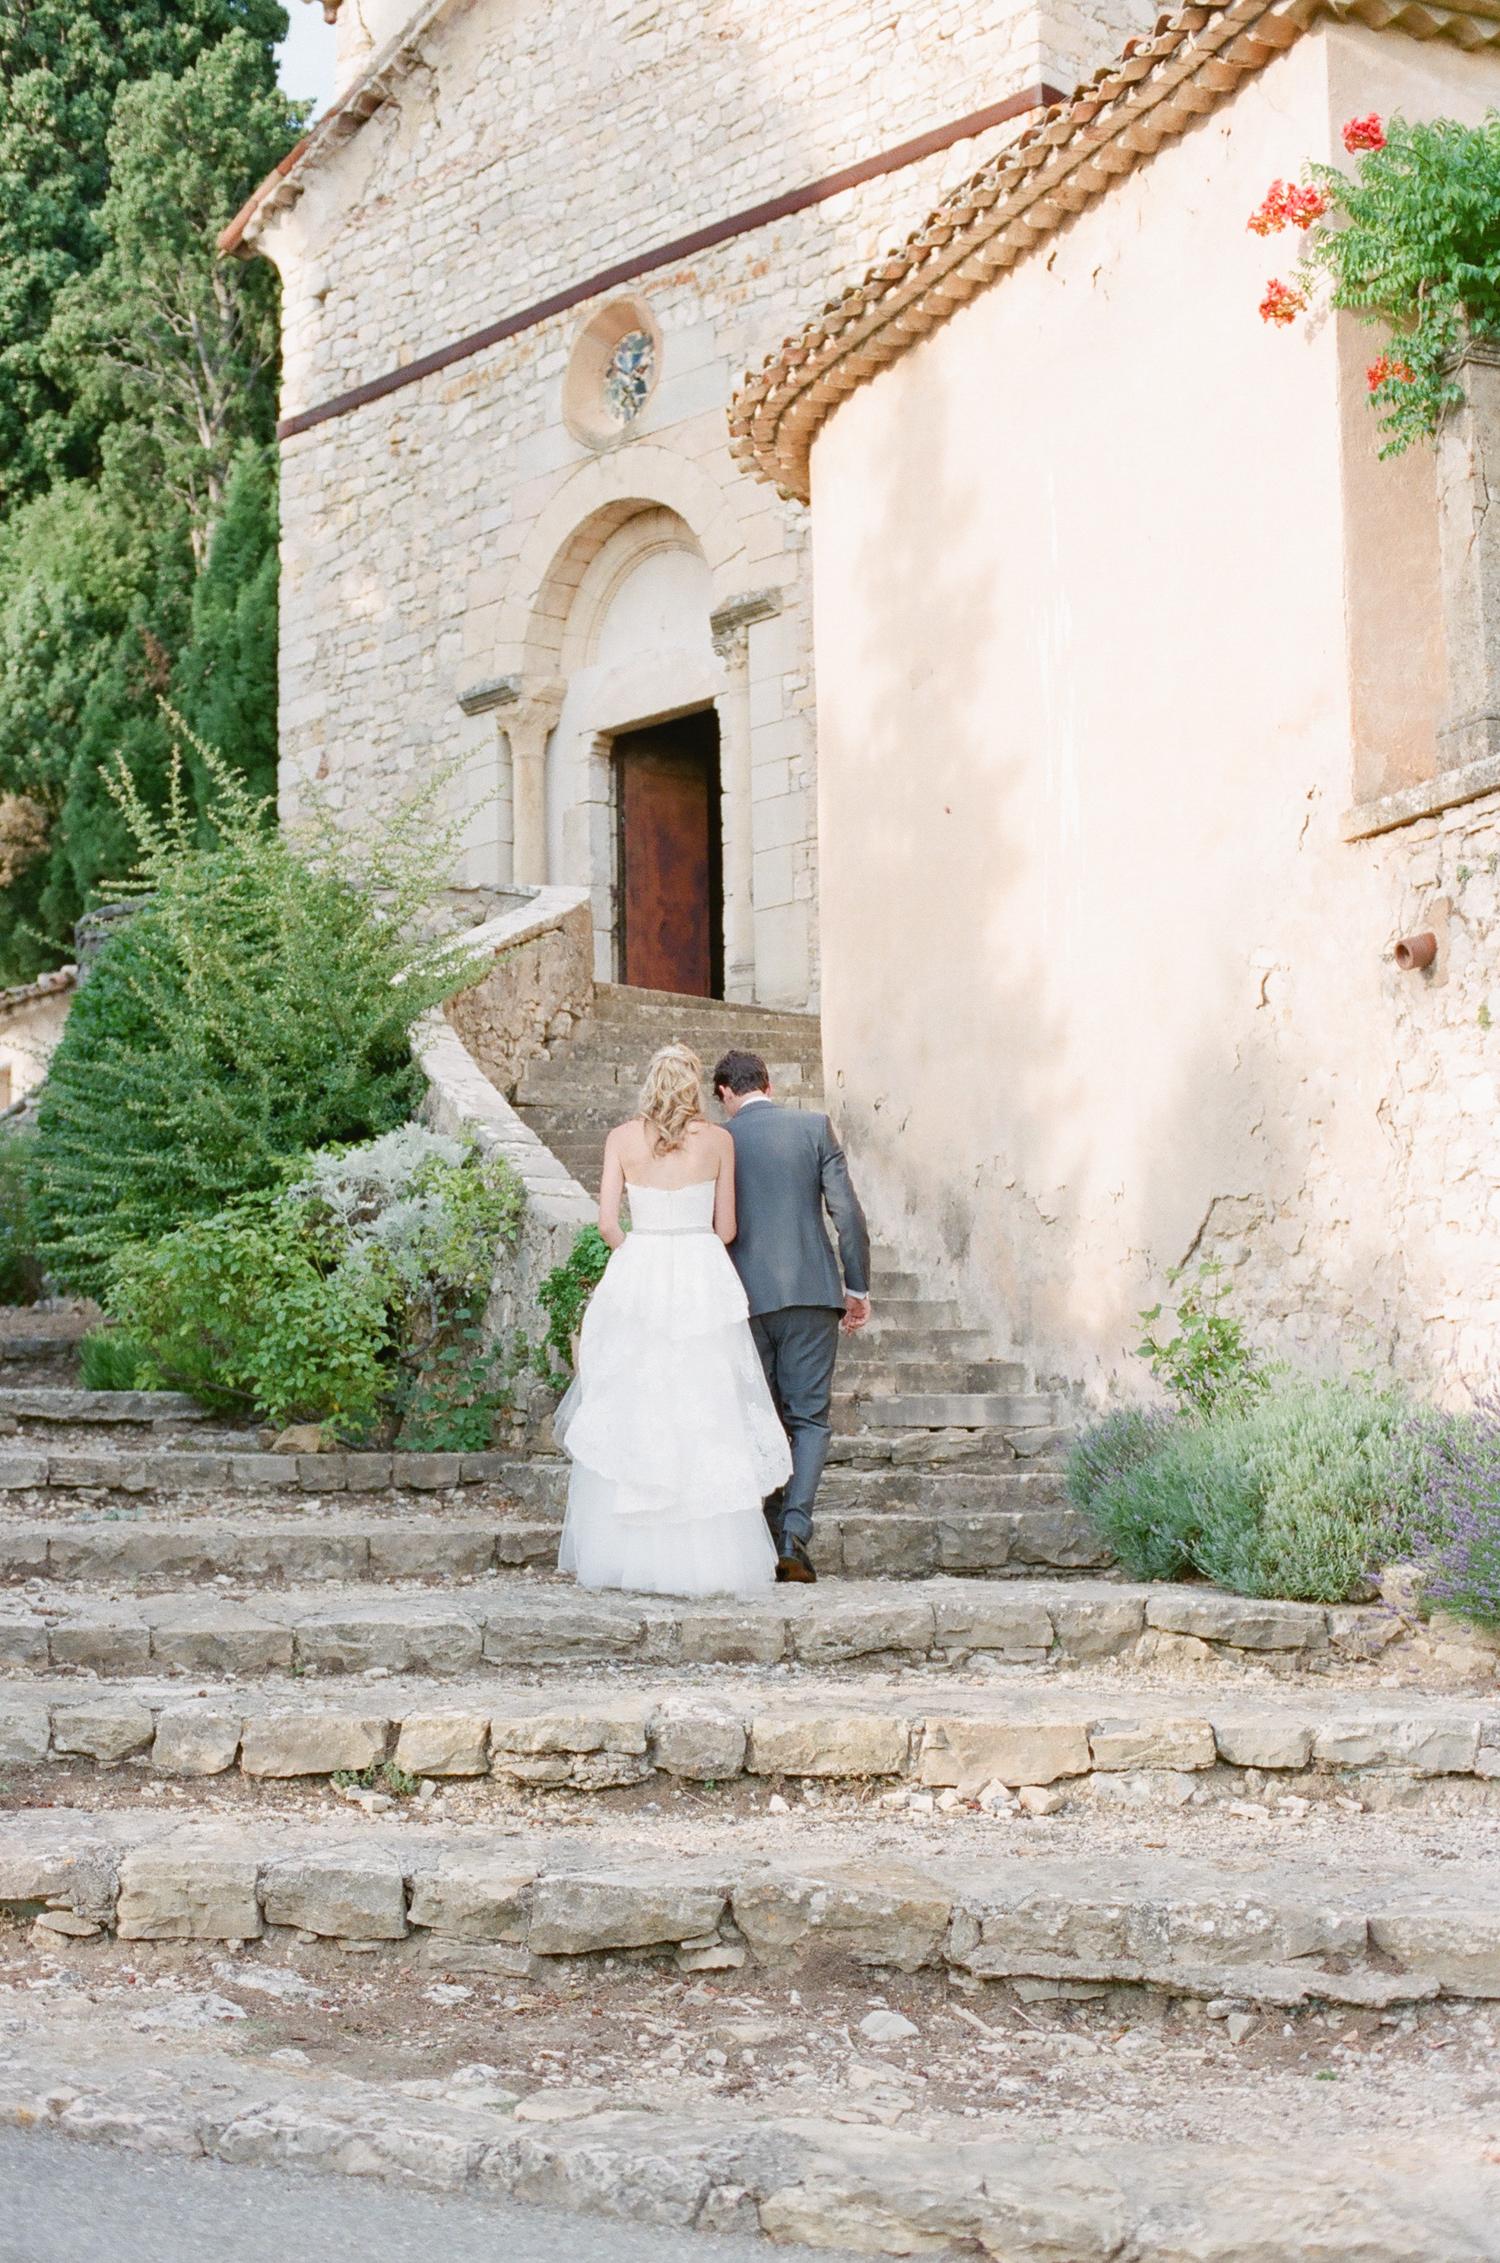 French_Wedding_(c)_Rory_Wylie-49.jpg